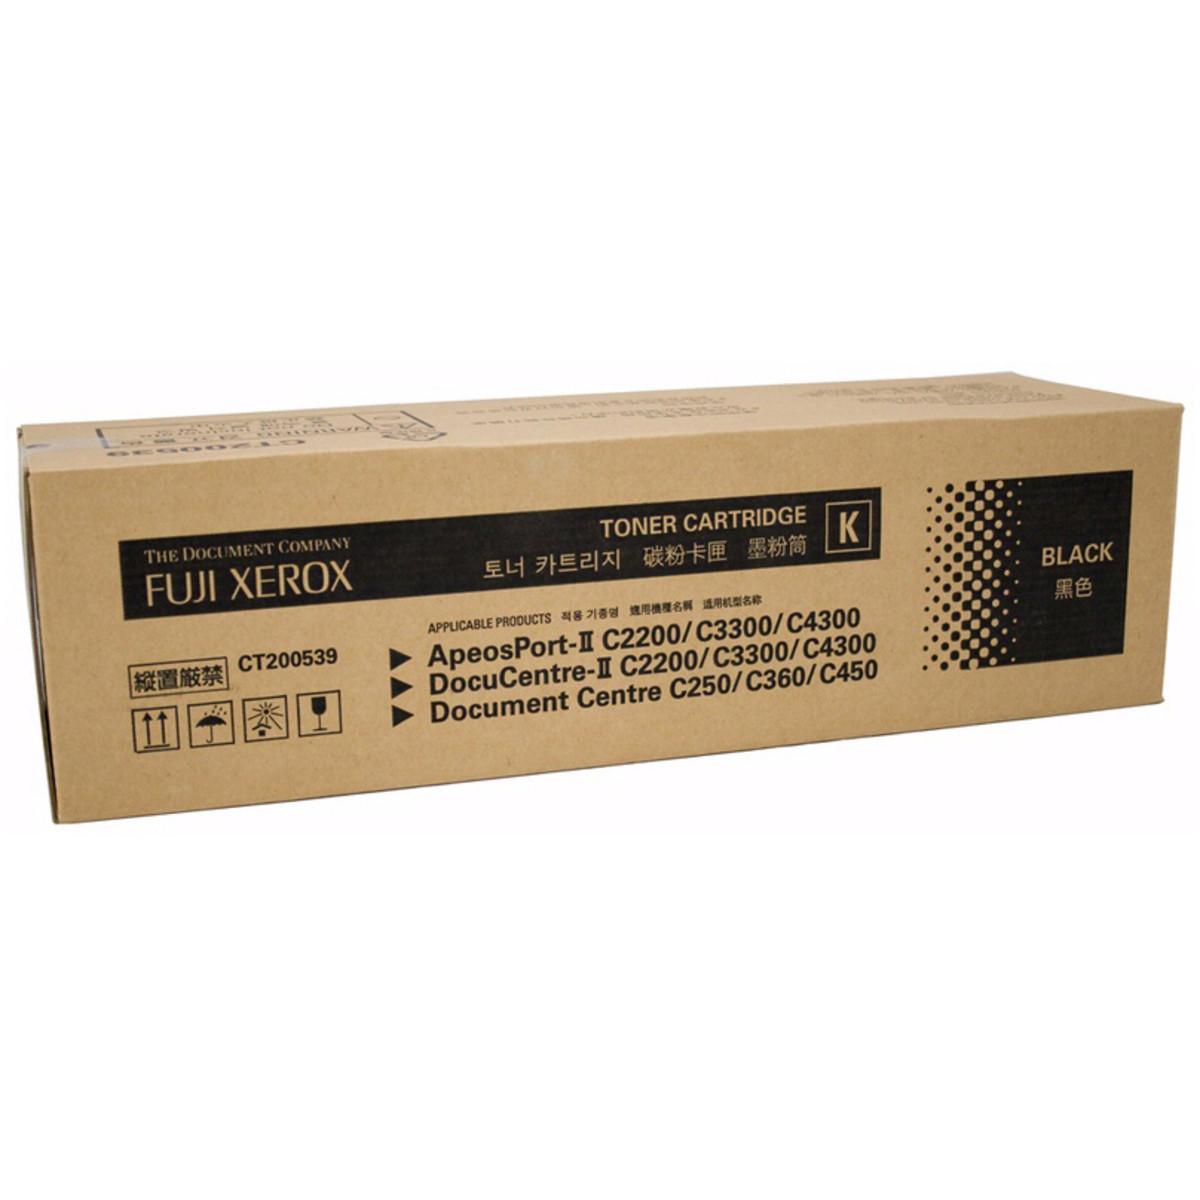 Xerox CT200539 Black Toner Cartridge